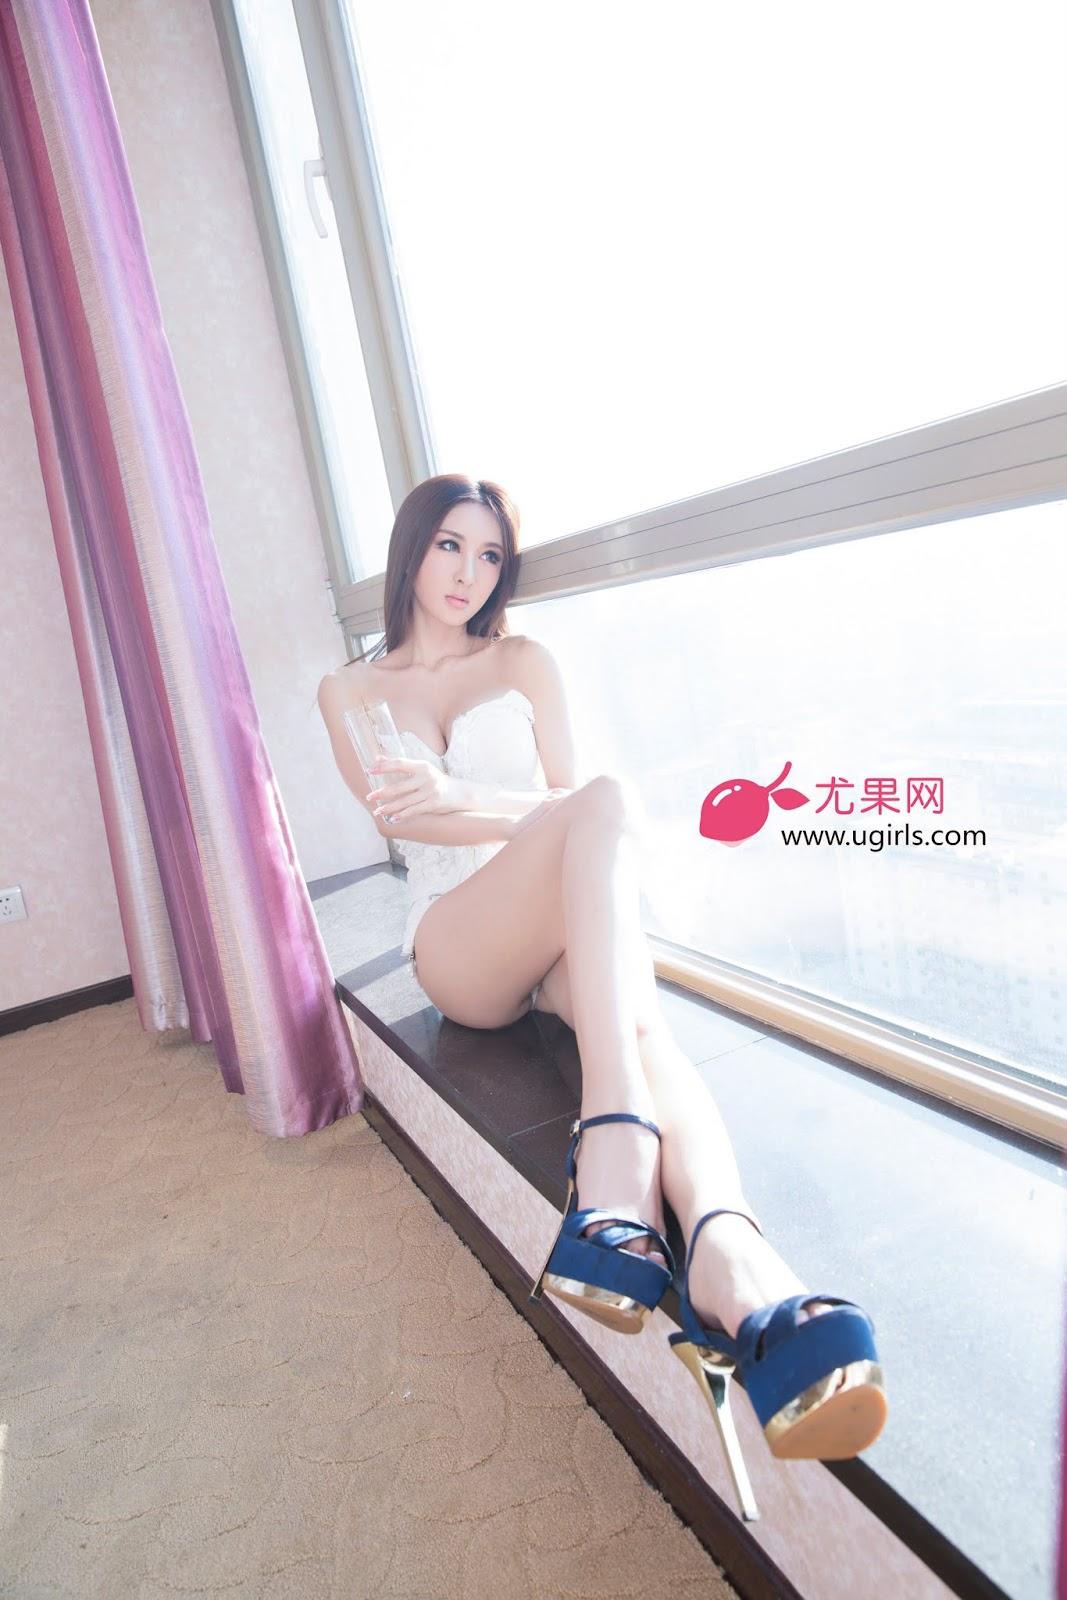 A14A6518 - Hot Photo UGIRLS NO.6 Nude Girl